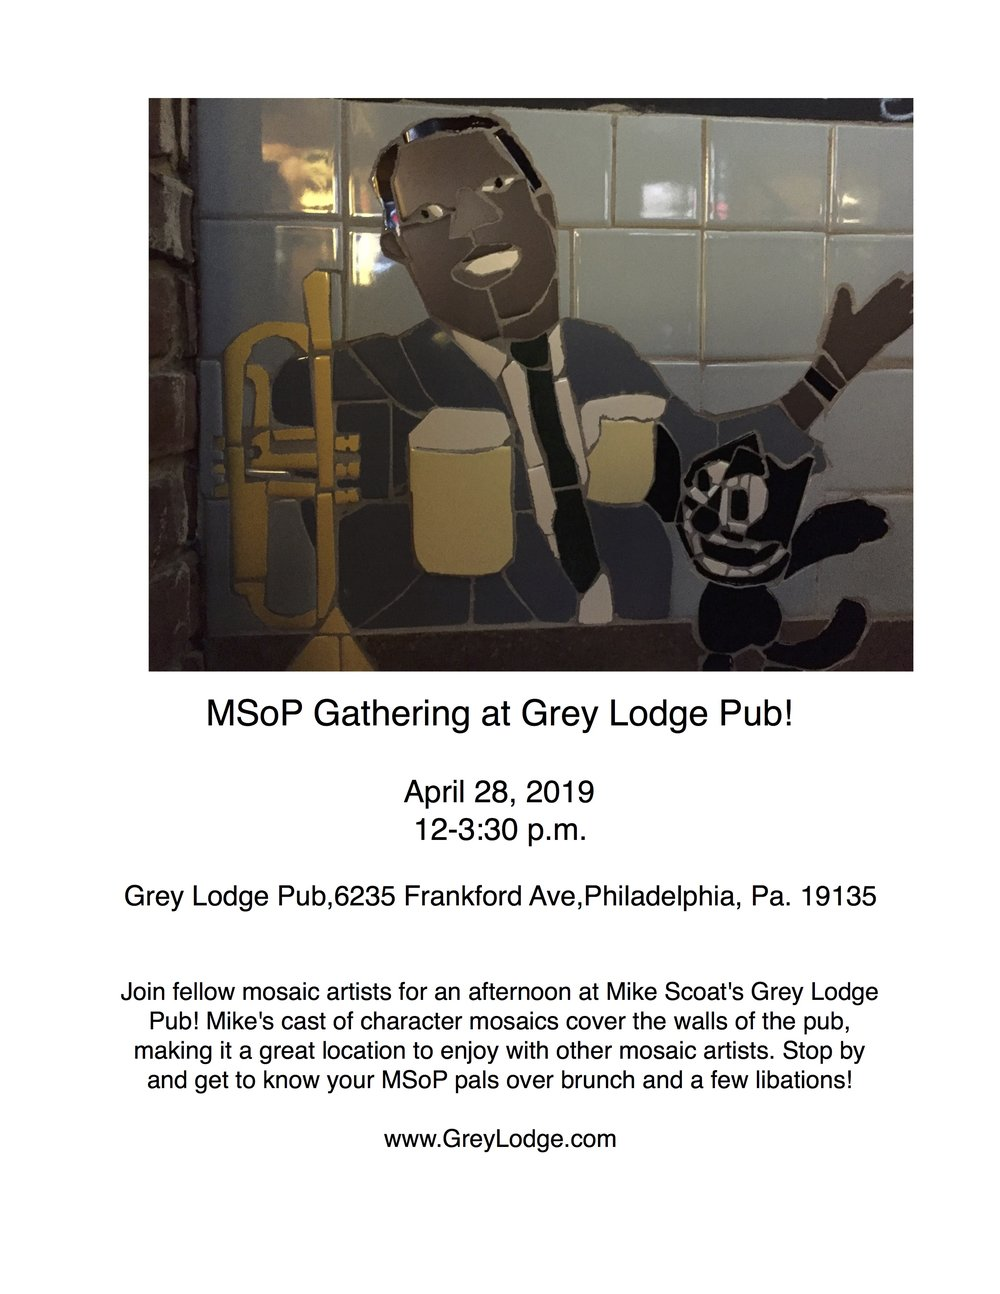 Grey Lodge Pub event .jpg